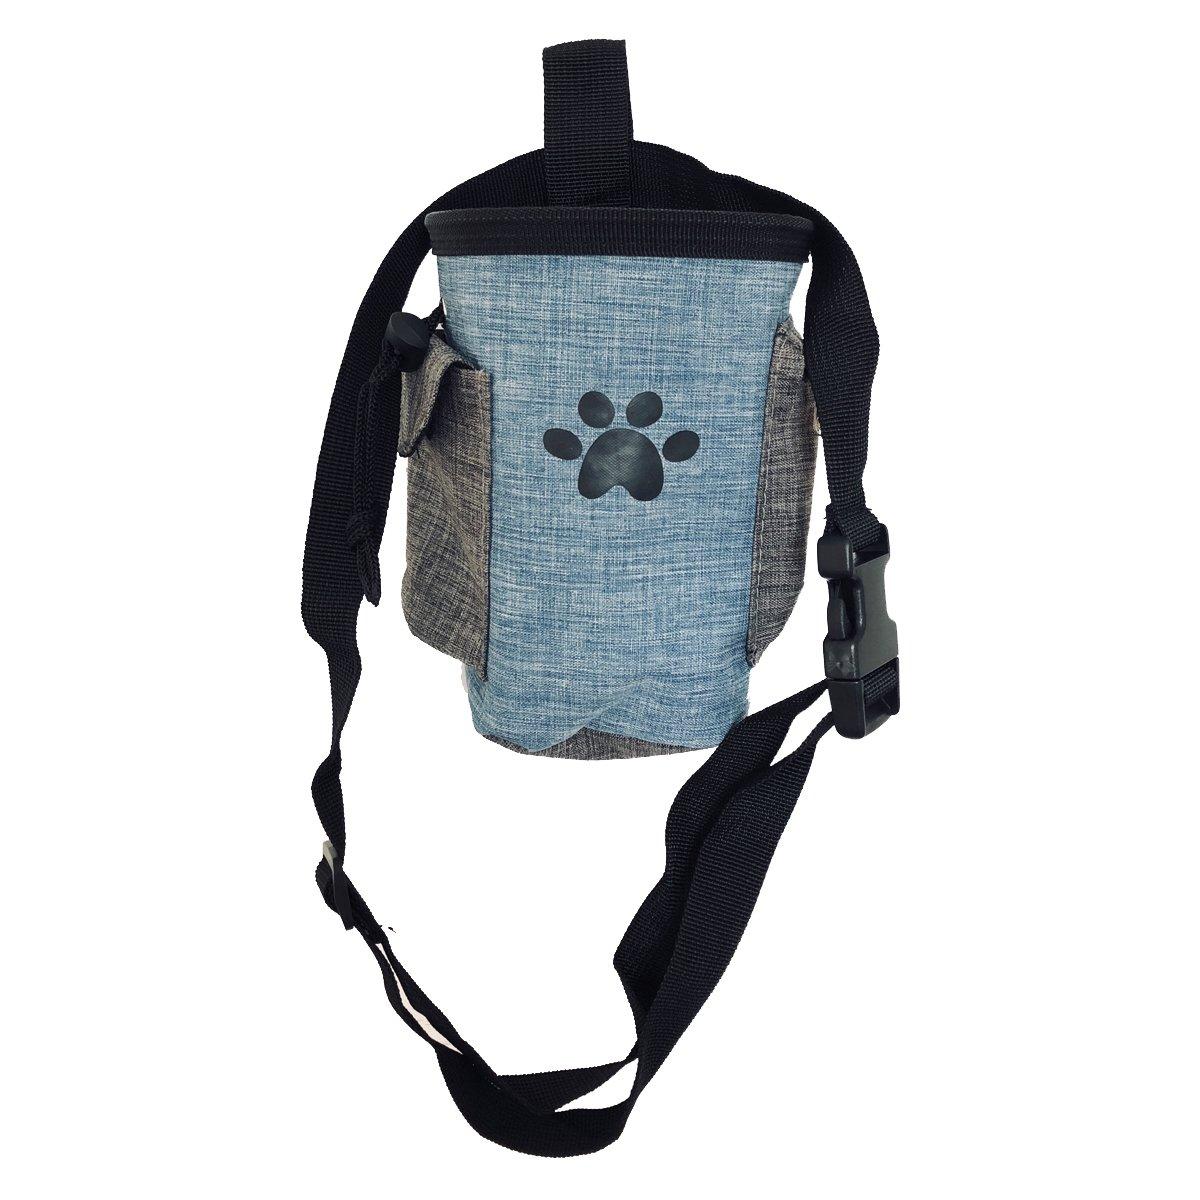 Pet Treat Pouch Dog Training Bag with Belt Carries Pet Toys Kibble Treats Sport Running Drawstring Waist Bag Poop Bag Dispenser (blue)